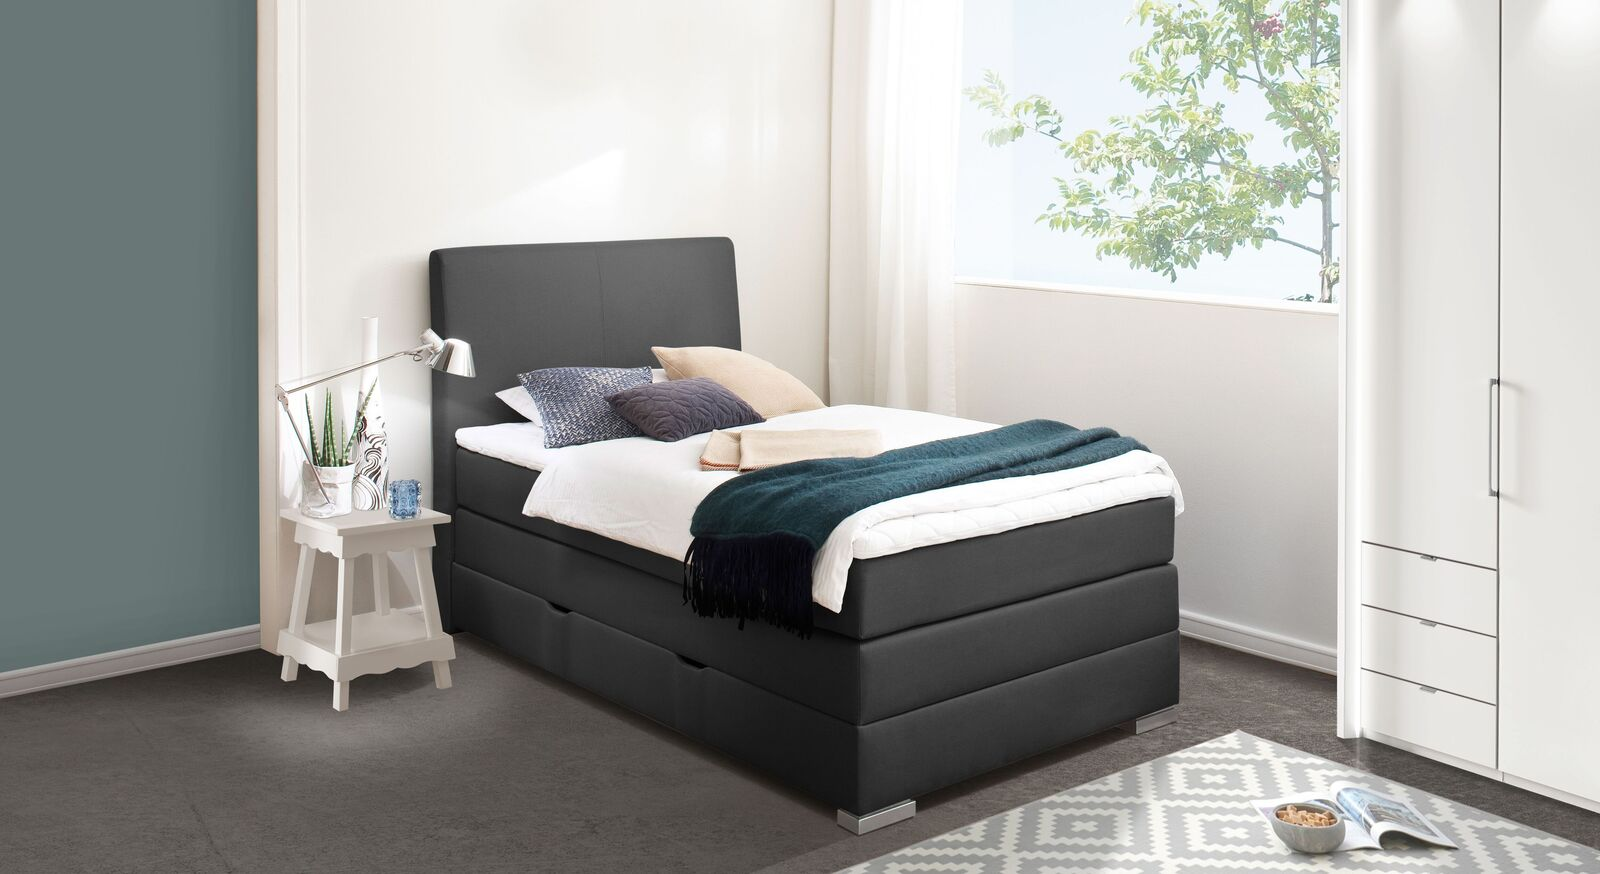 Bettkasten-Boxspringbett Ivetta mit passenden Möbeln